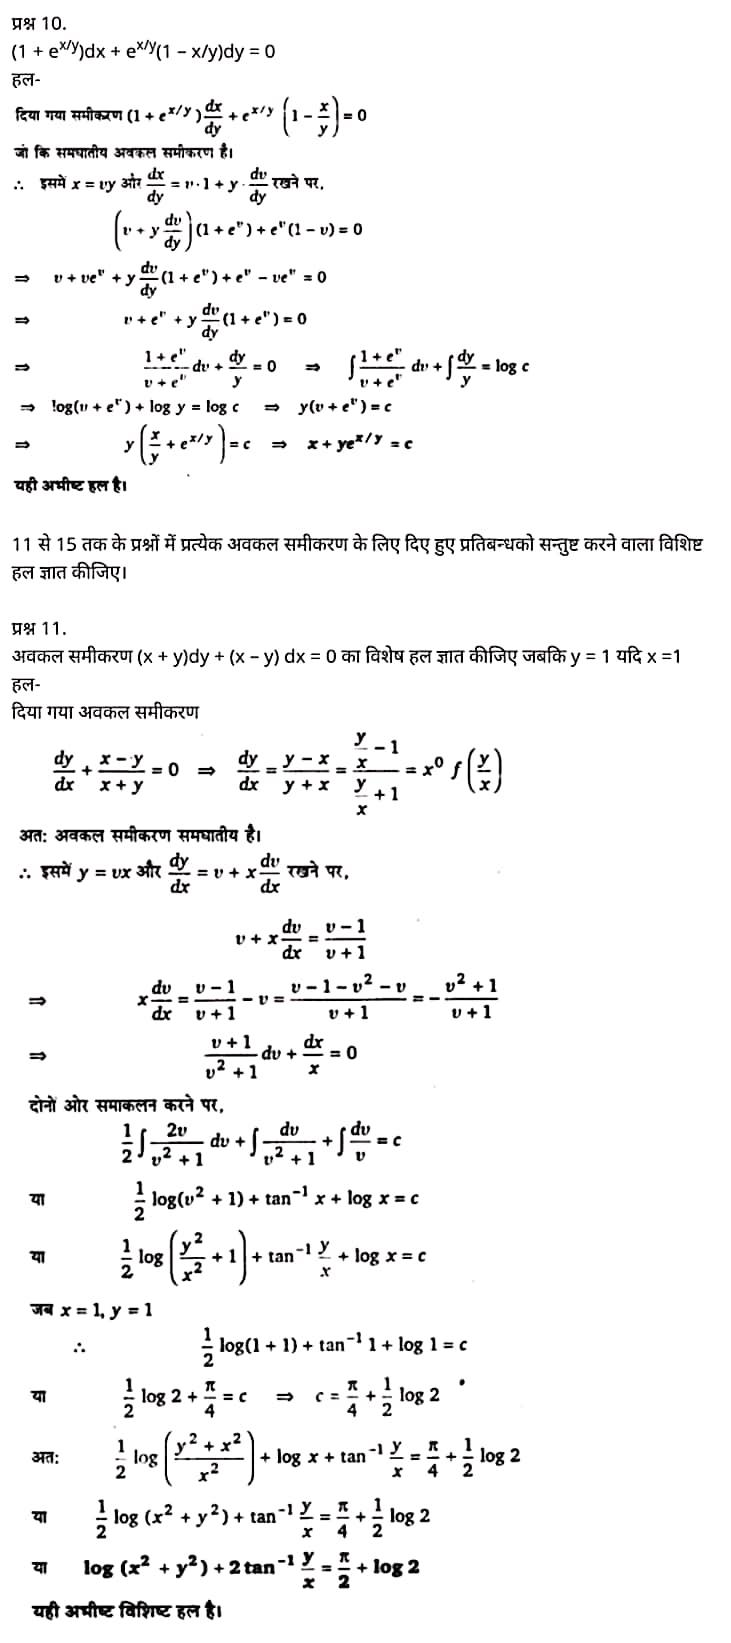 """Class 12 Maths Chapter 9"", "" Differential Equations"", Hindi Medium मैथ्स कक्षा 12 नोट्स pdf,  मैथ्स कक्षा 12 नोट्स 2021 NCERT,  मैथ्स कक्षा 12 PDF,  मैथ्स पुस्तक,  मैथ्स की बुक,  मैथ्स प्रश्नोत्तरी Class 12, 12 वीं मैथ्स पुस्तक RBSE,  बिहार बोर्ड 12 वीं मैथ्स नोट्स,   12th Maths book in hindi,12th Maths notes in hindi,cbse books for class 12,cbse books in hindi,cbse ncert books,class 12 Maths notes in hindi,class 12 hindi ncert solutions,Maths 2020,Maths 2021,Maths 2022,Maths book class 12,Maths book in hindi,Maths class 12 in hindi,Maths notes for class 12 up board in hindi,ncert all books,ncert app in hindi,ncert book solution,ncert books class 10,ncert books class 12,ncert books for class 7,ncert books for upsc in hindi,ncert books in hindi class 10,ncert books in hindi for class 12 Maths,ncert books in hindi for class 6,ncert books in hindi pdf,ncert class 12 hindi book,ncert english book,ncert Maths book in hindi,ncert Maths books in hindi pdf,ncert Maths class 12,ncert in hindi,old ncert books in hindi,online ncert books in hindi,up board 12th,up board 12th syllabus,up board class 10 hindi book,up board class 12 books,up board class 12 new syllabus,up Board Maths 2020,up Board Maths 2021,up Board Maths 2022,up Board Maths 2023,up board intermediate Maths syllabus,up board intermediate syllabus 2021,Up board Master 2021,up board model paper 2021,up board model paper all subject,up board new syllabus of class 12th Maths,up board paper 2021,Up board syllabus 2021,UP board syllabus 2022,  12 वीं मैथ्स पुस्तक हिंदी में, 12 वीं मैथ्स नोट्स हिंदी में, कक्षा 12 के लिए सीबीएससी पुस्तकें, हिंदी में सीबीएससी पुस्तकें, सीबीएससी  पुस्तकें, कक्षा 12 मैथ्स नोट्स हिंदी में, कक्षा 12 हिंदी एनसीईआरटी समाधान, मैथ्स 2020, मैथ्स 2021, मैथ्स 2022, मैथ्स  बुक क्लास 12, मैथ्स बुक इन हिंदी, बायोलॉजी क्लास 12 हिंदी में, मैथ्स नोट्स इन क्लास 12 यूपी  बोर्ड इन हिंदी, एनसीईआरटी मैथ्स की किताब हिंदी में,  बोर्ड 12 वीं तक, 12 वीं तक की पाठ्यक्रम, बोर्ड कक्षा 10 की हिंदी पुस्तक  , बोर्ड की "